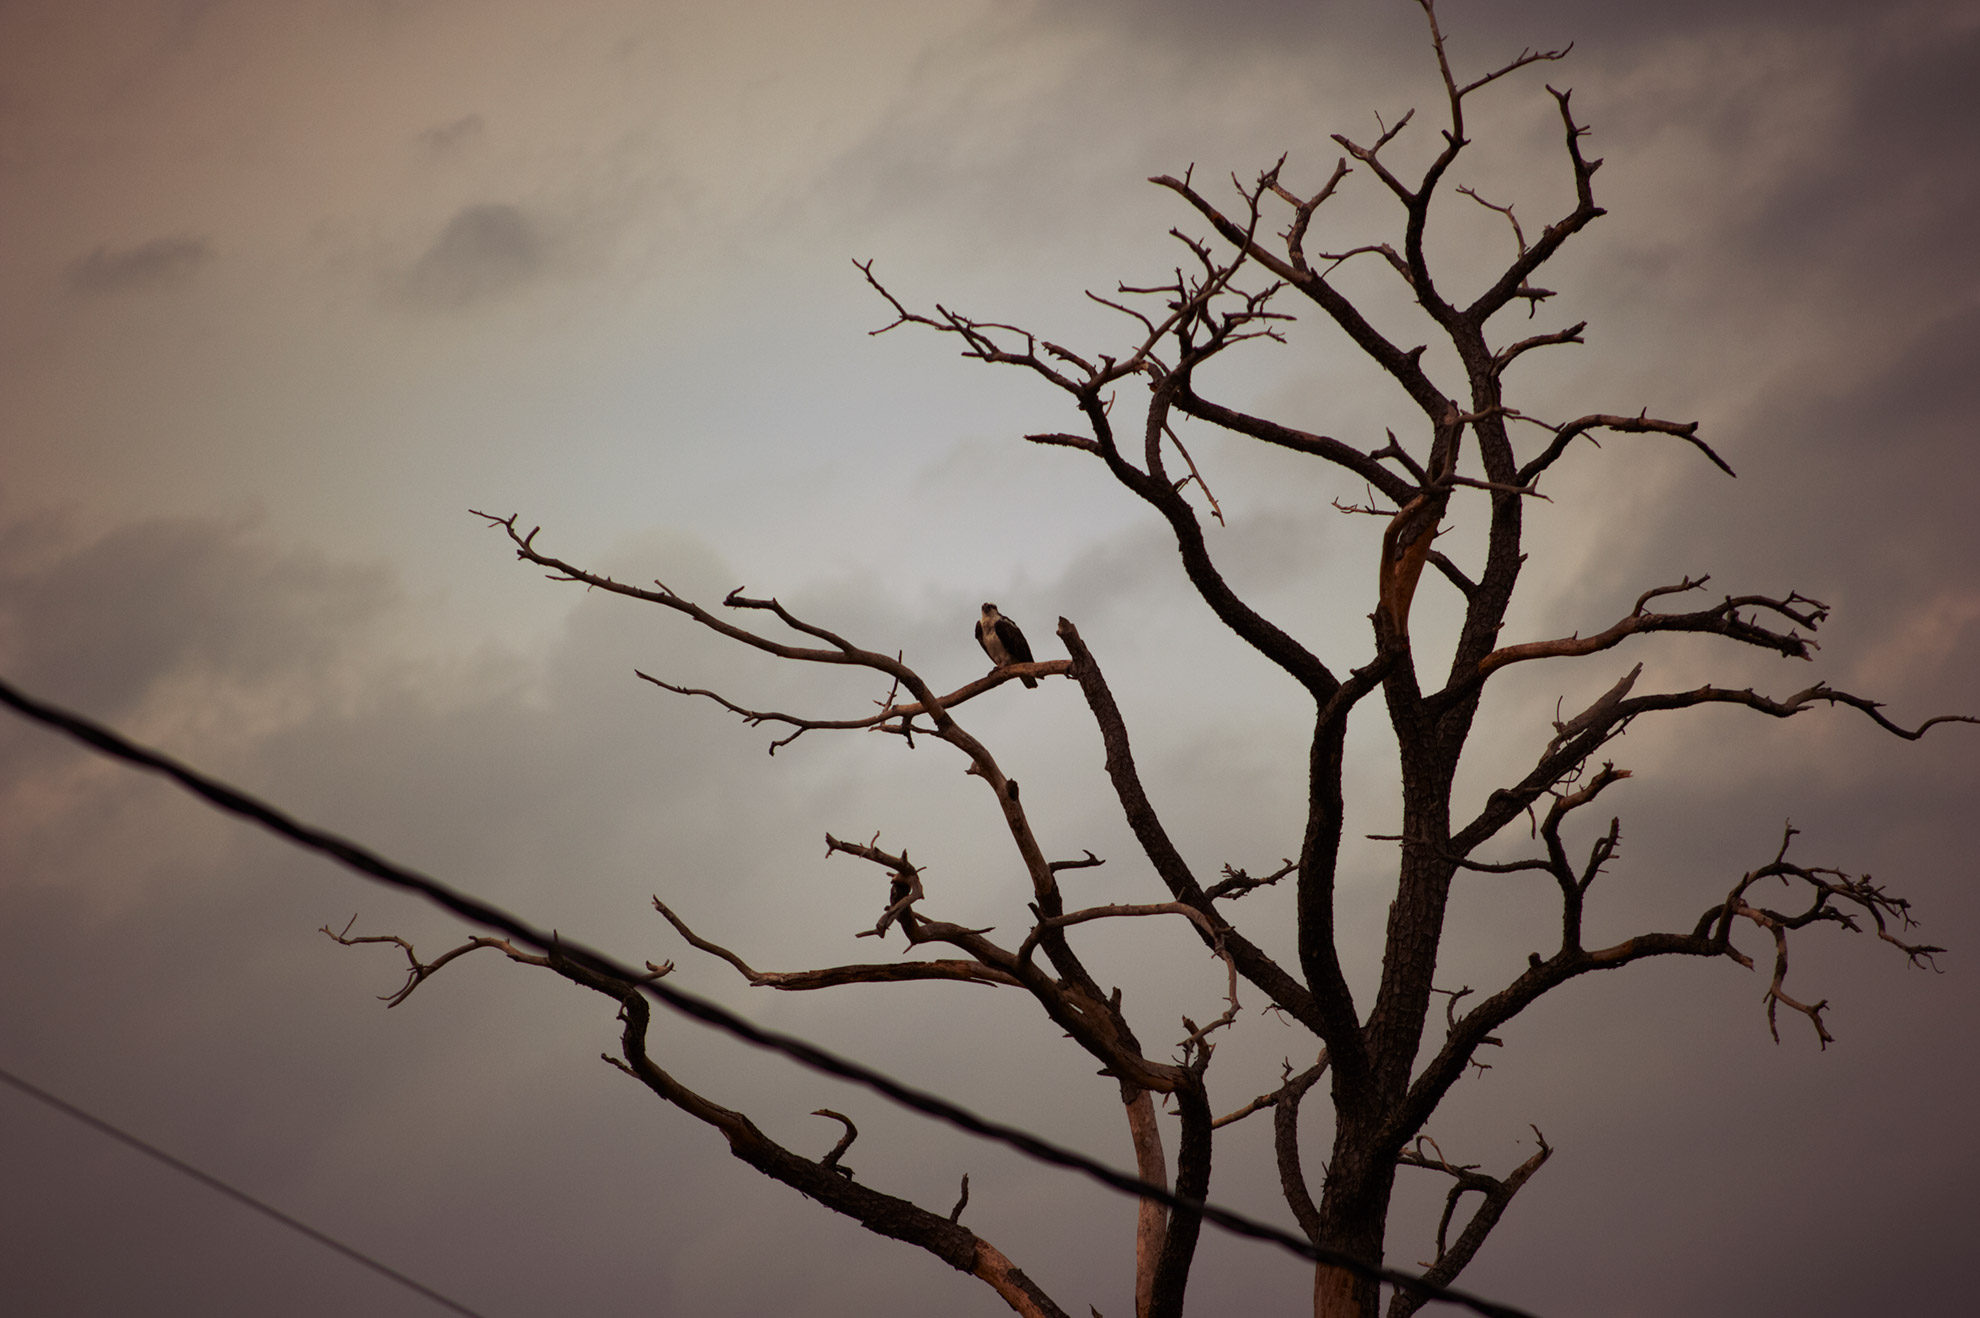 sarah_neale_photography_art_4.jpg